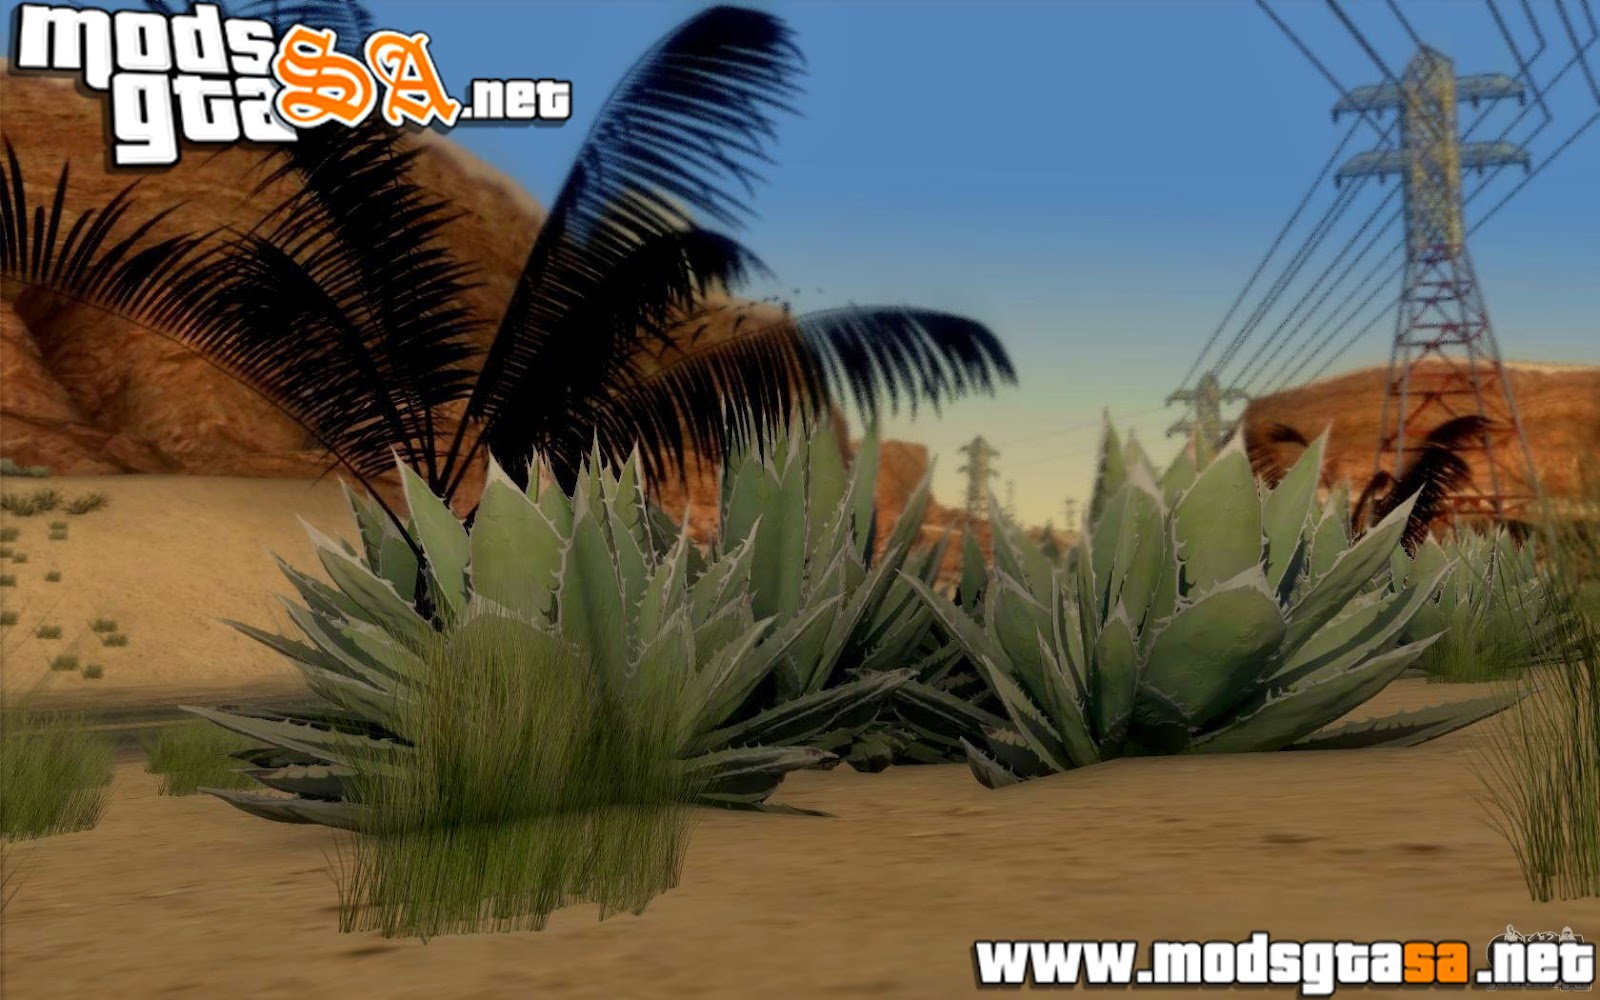 SA - Rosa Project v1.0 (Deserto)